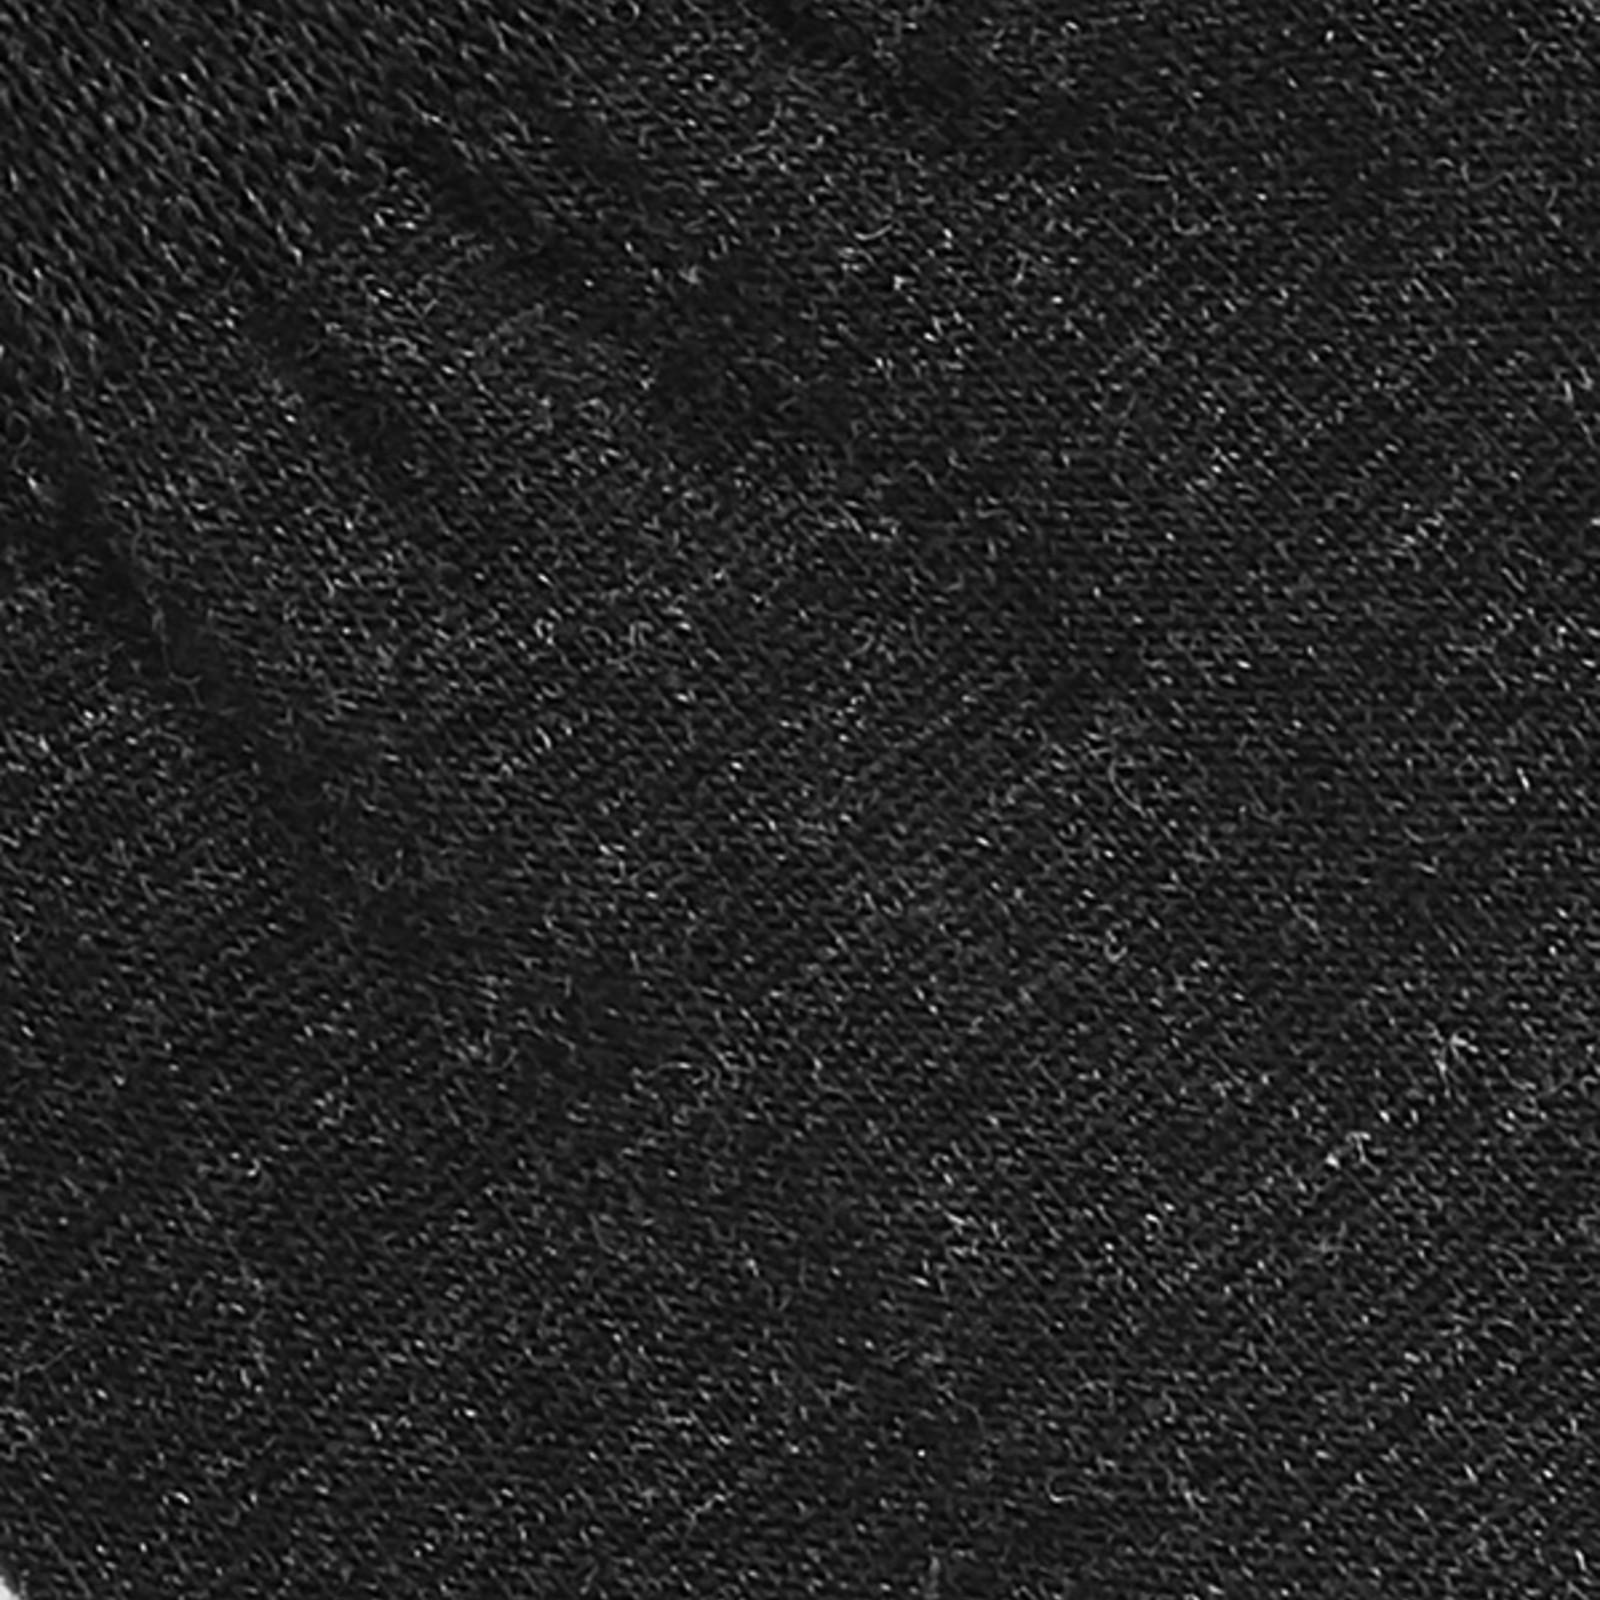 Carlo Lanza Dunkelgraue Merino Wolle Socken